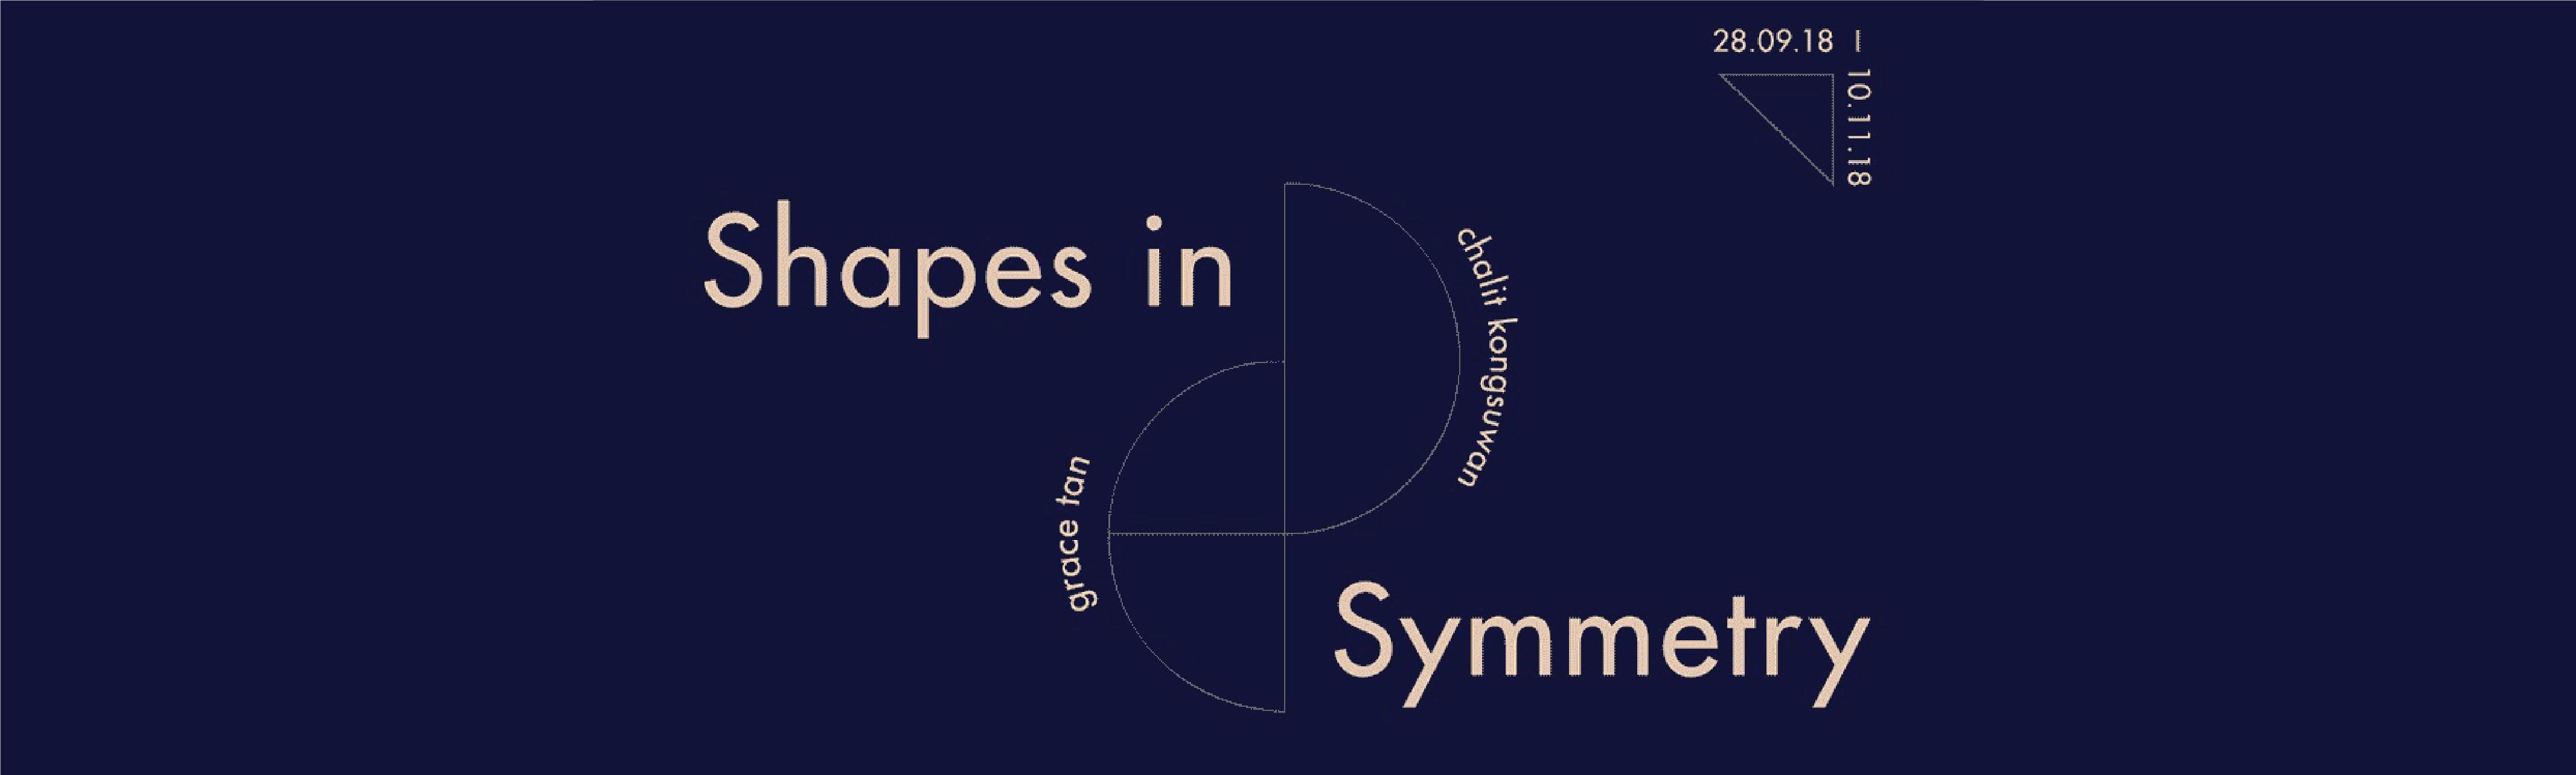 shapes in symmetry-02